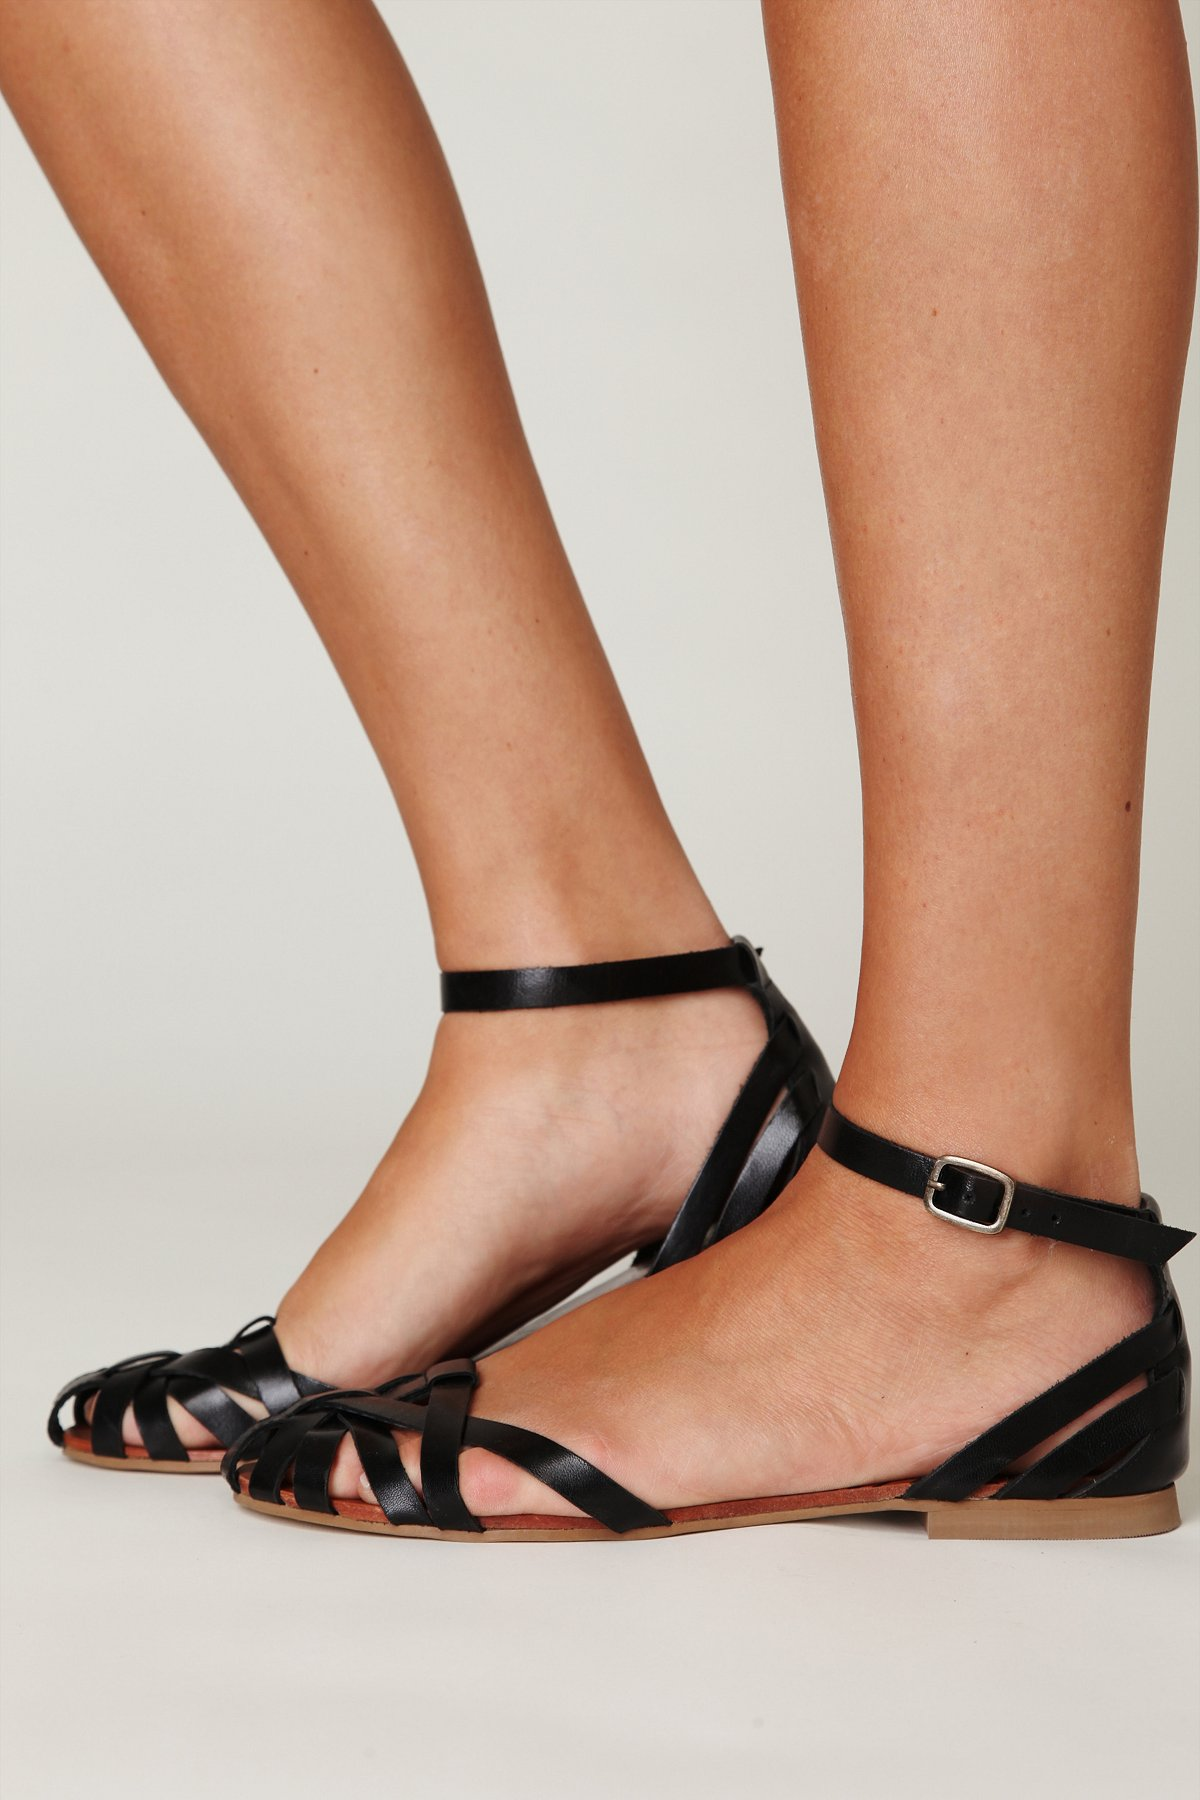 Lex Leather Sandal